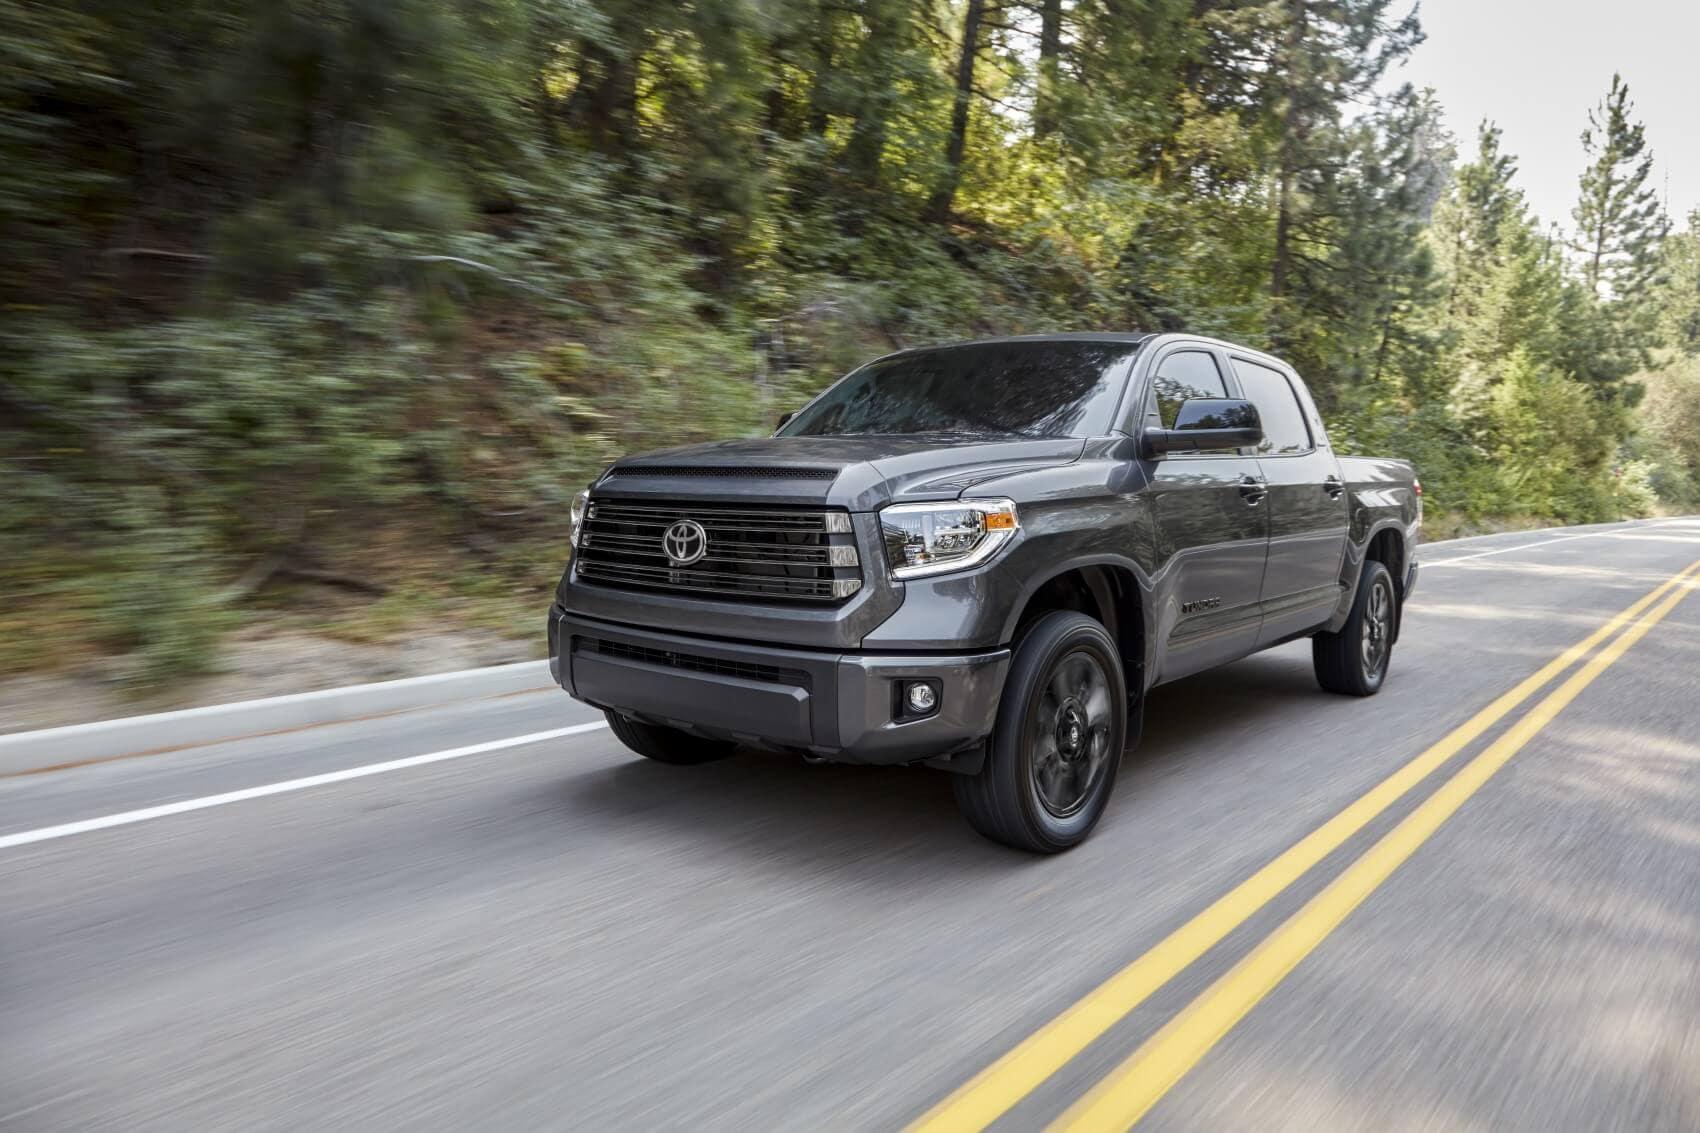 2021 Toyota Tundra Performance